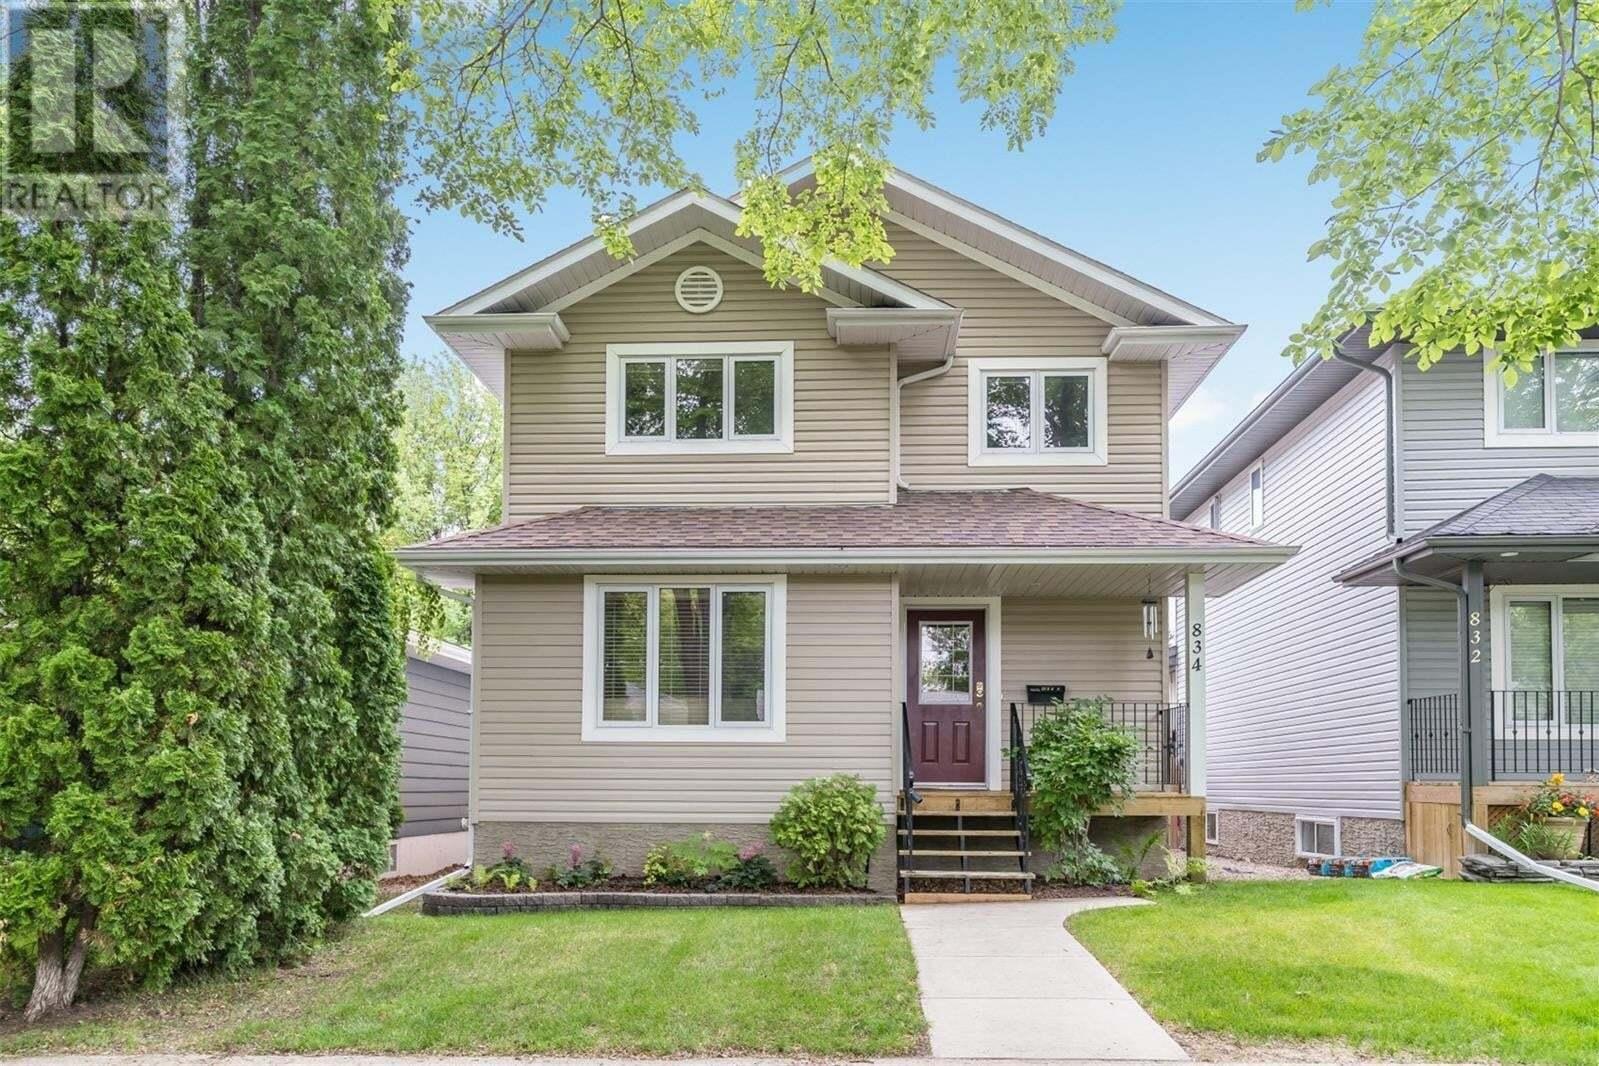 House for sale at 834 7th St E Saskatoon Saskatchewan - MLS: SK817316